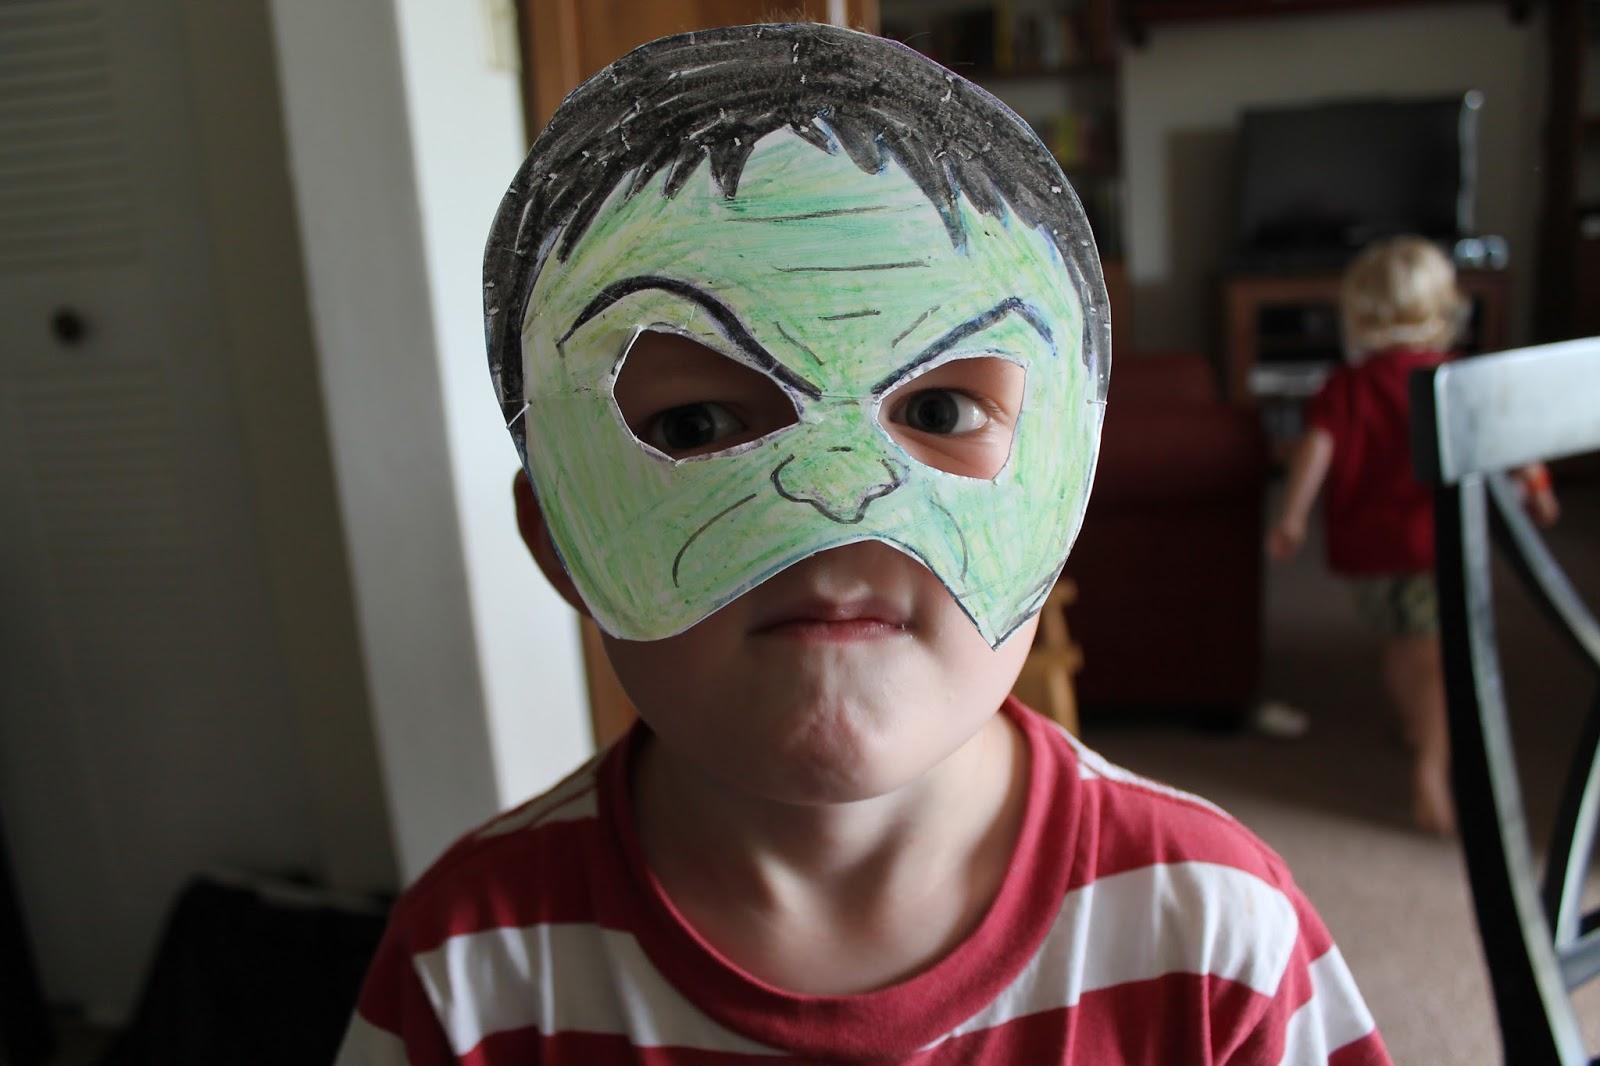 Freshly Completed How To Make Super Hero Masks In Under